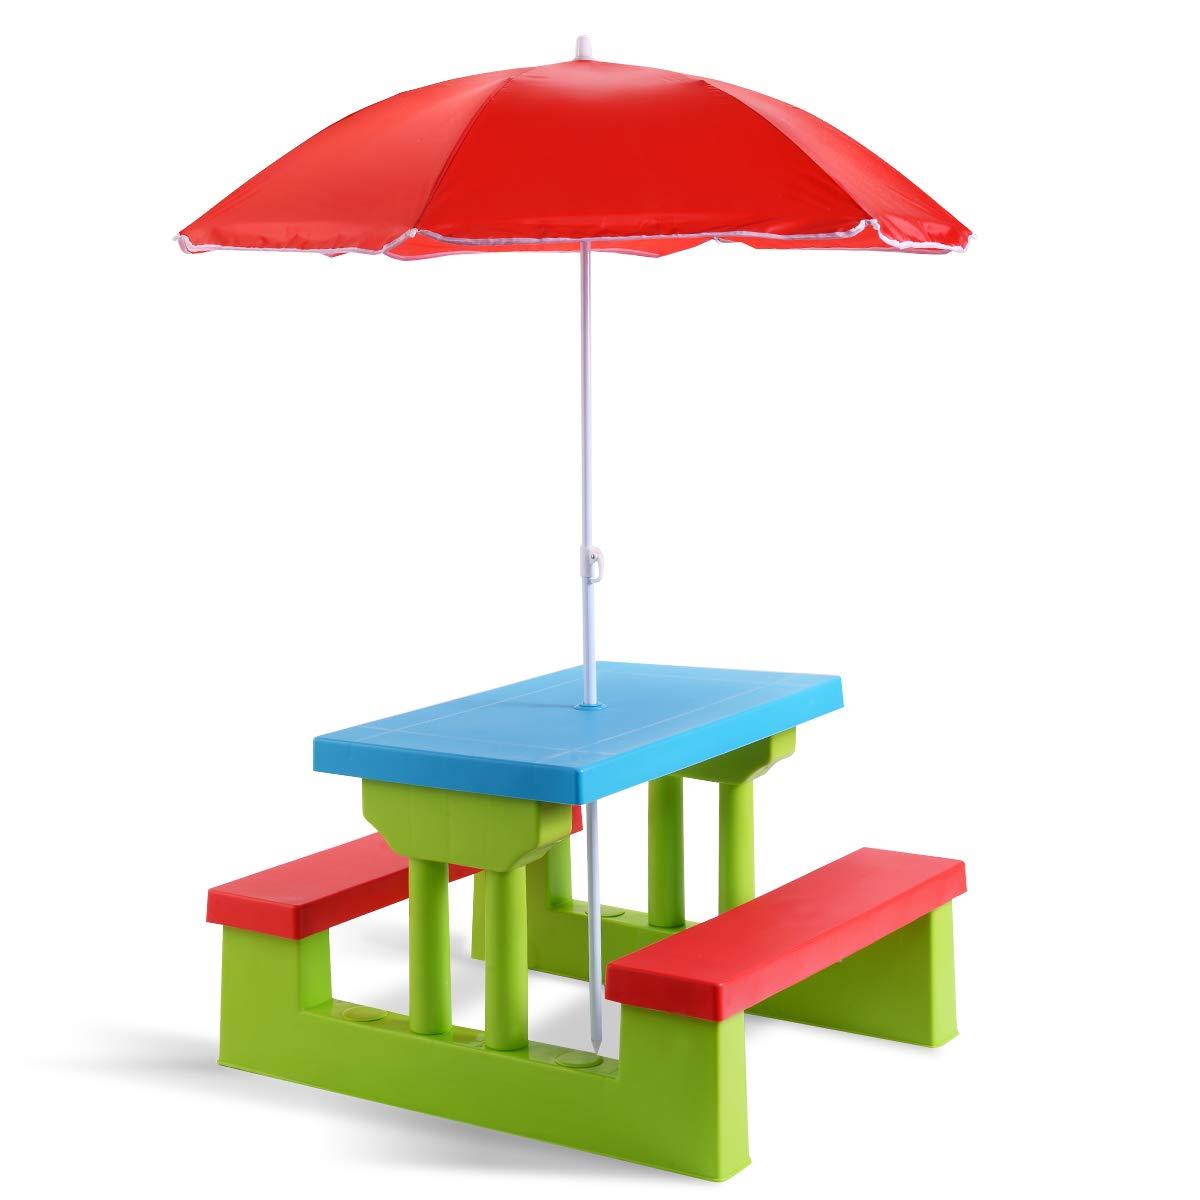 Costzon Kids Picnic Table Set Children Junior Rainbow Bench w/Umbrella (Red & Green) by Costzon